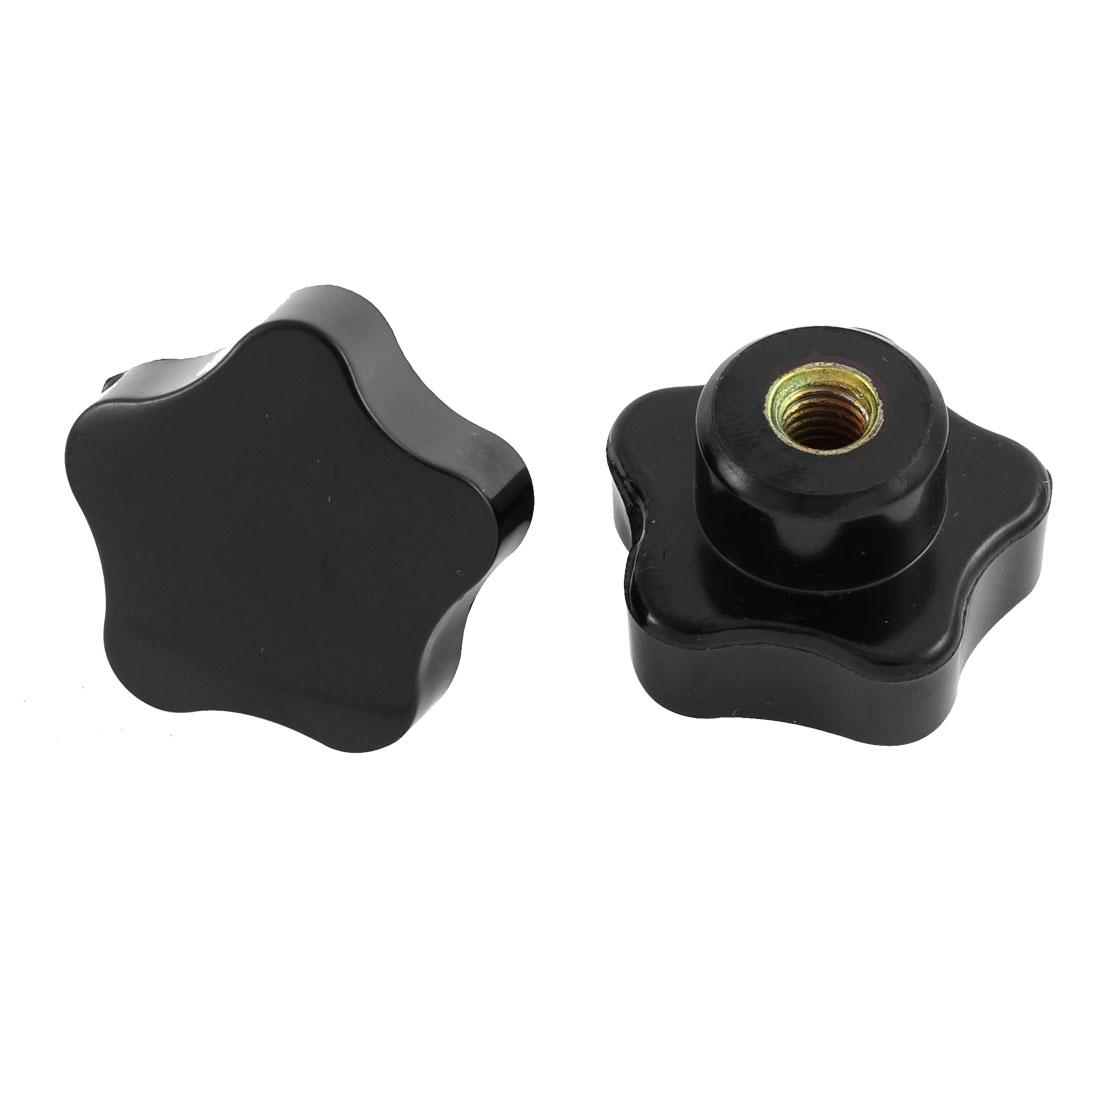 2pcs 7mm Female Threaded Diameter Black Plastic Screw On Type Clamping Star Knob Grip